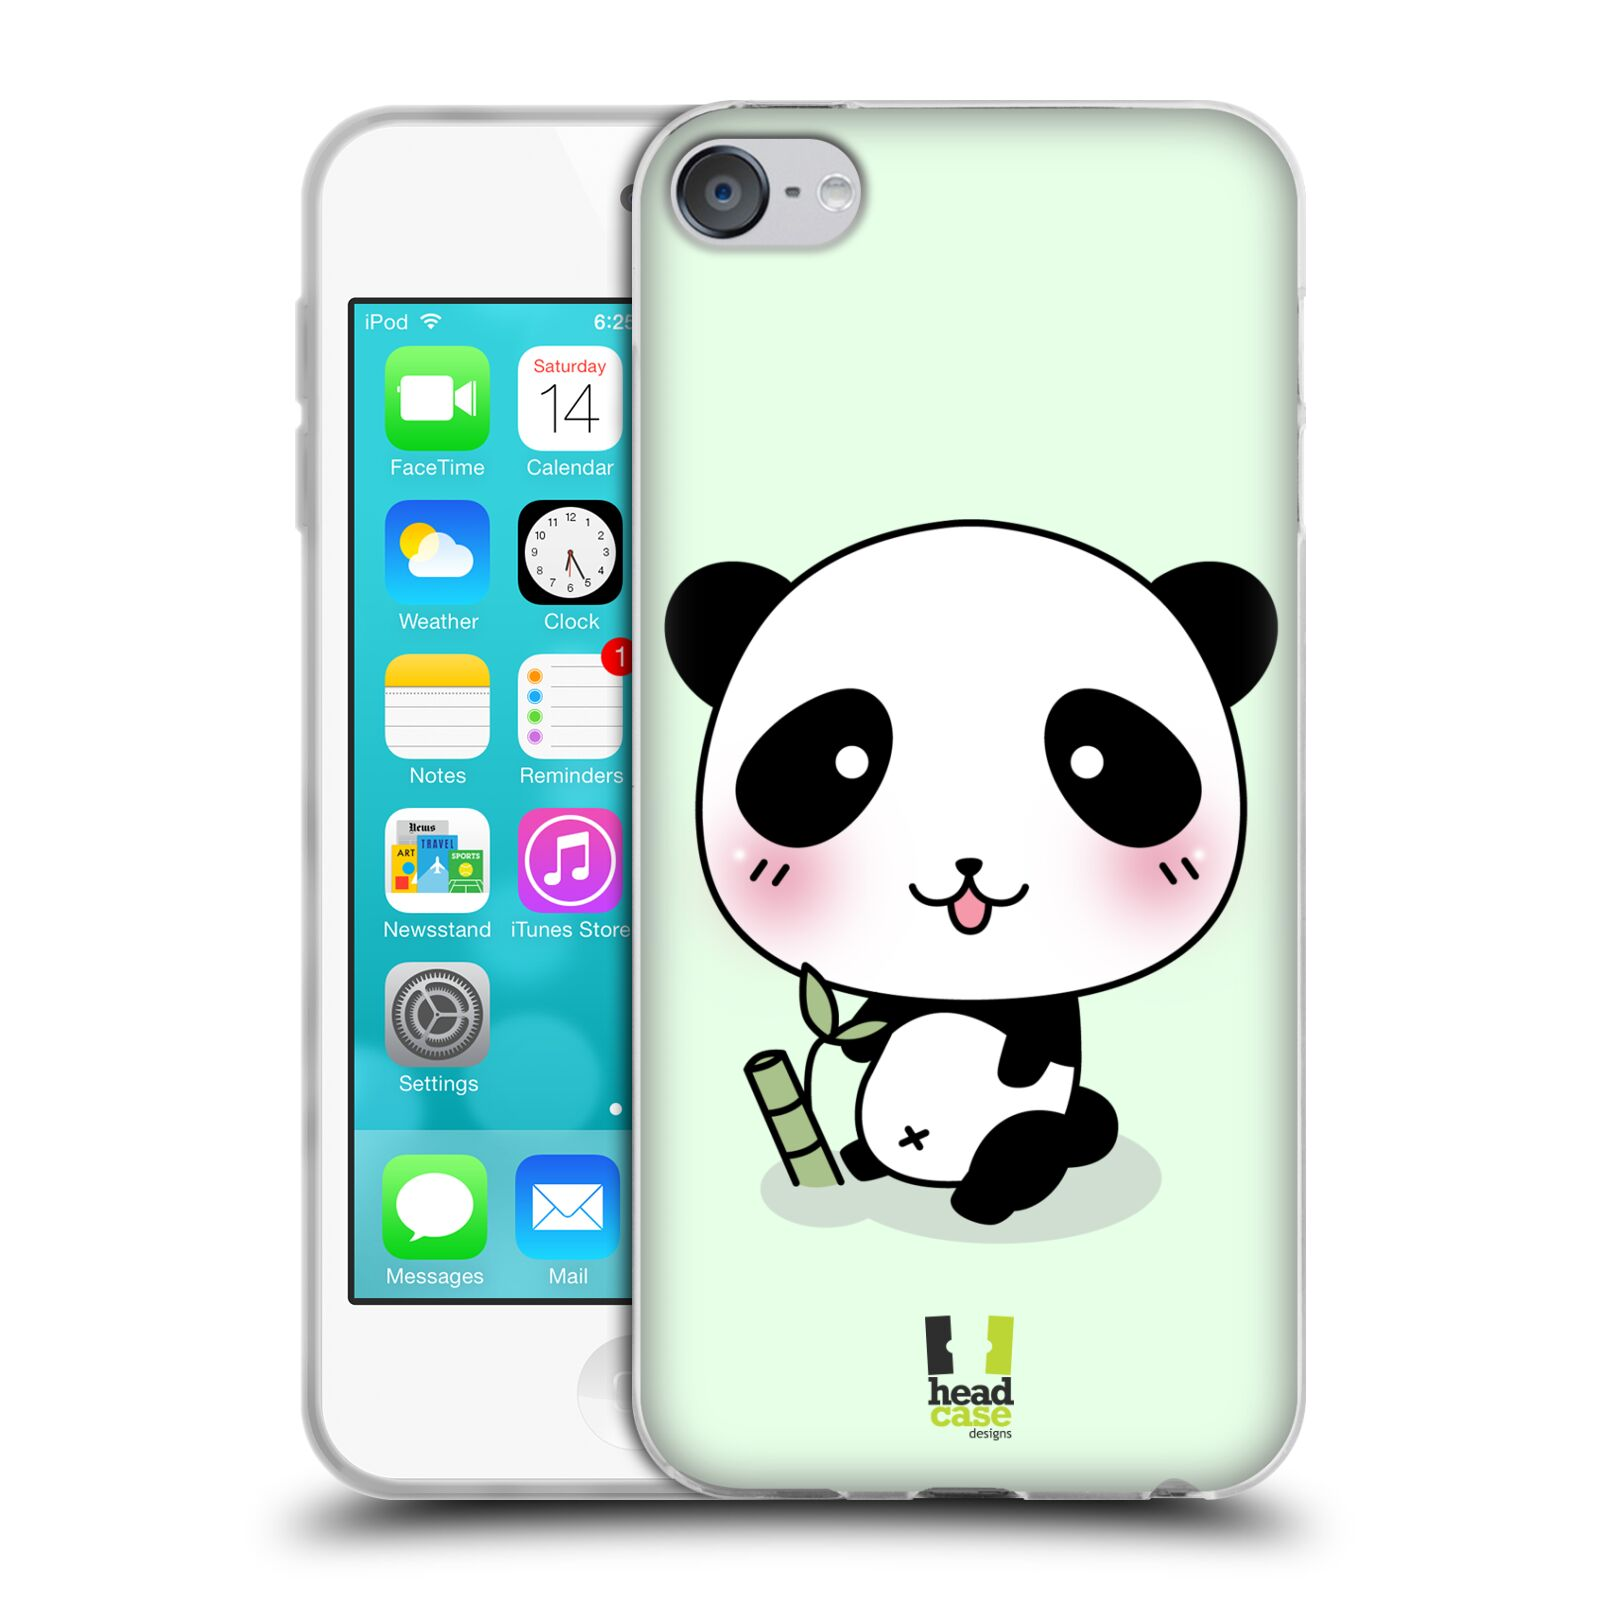 head case kawaii panda series 1 soft gel case for apple ipod touch 6g 6th gen ebay. Black Bedroom Furniture Sets. Home Design Ideas